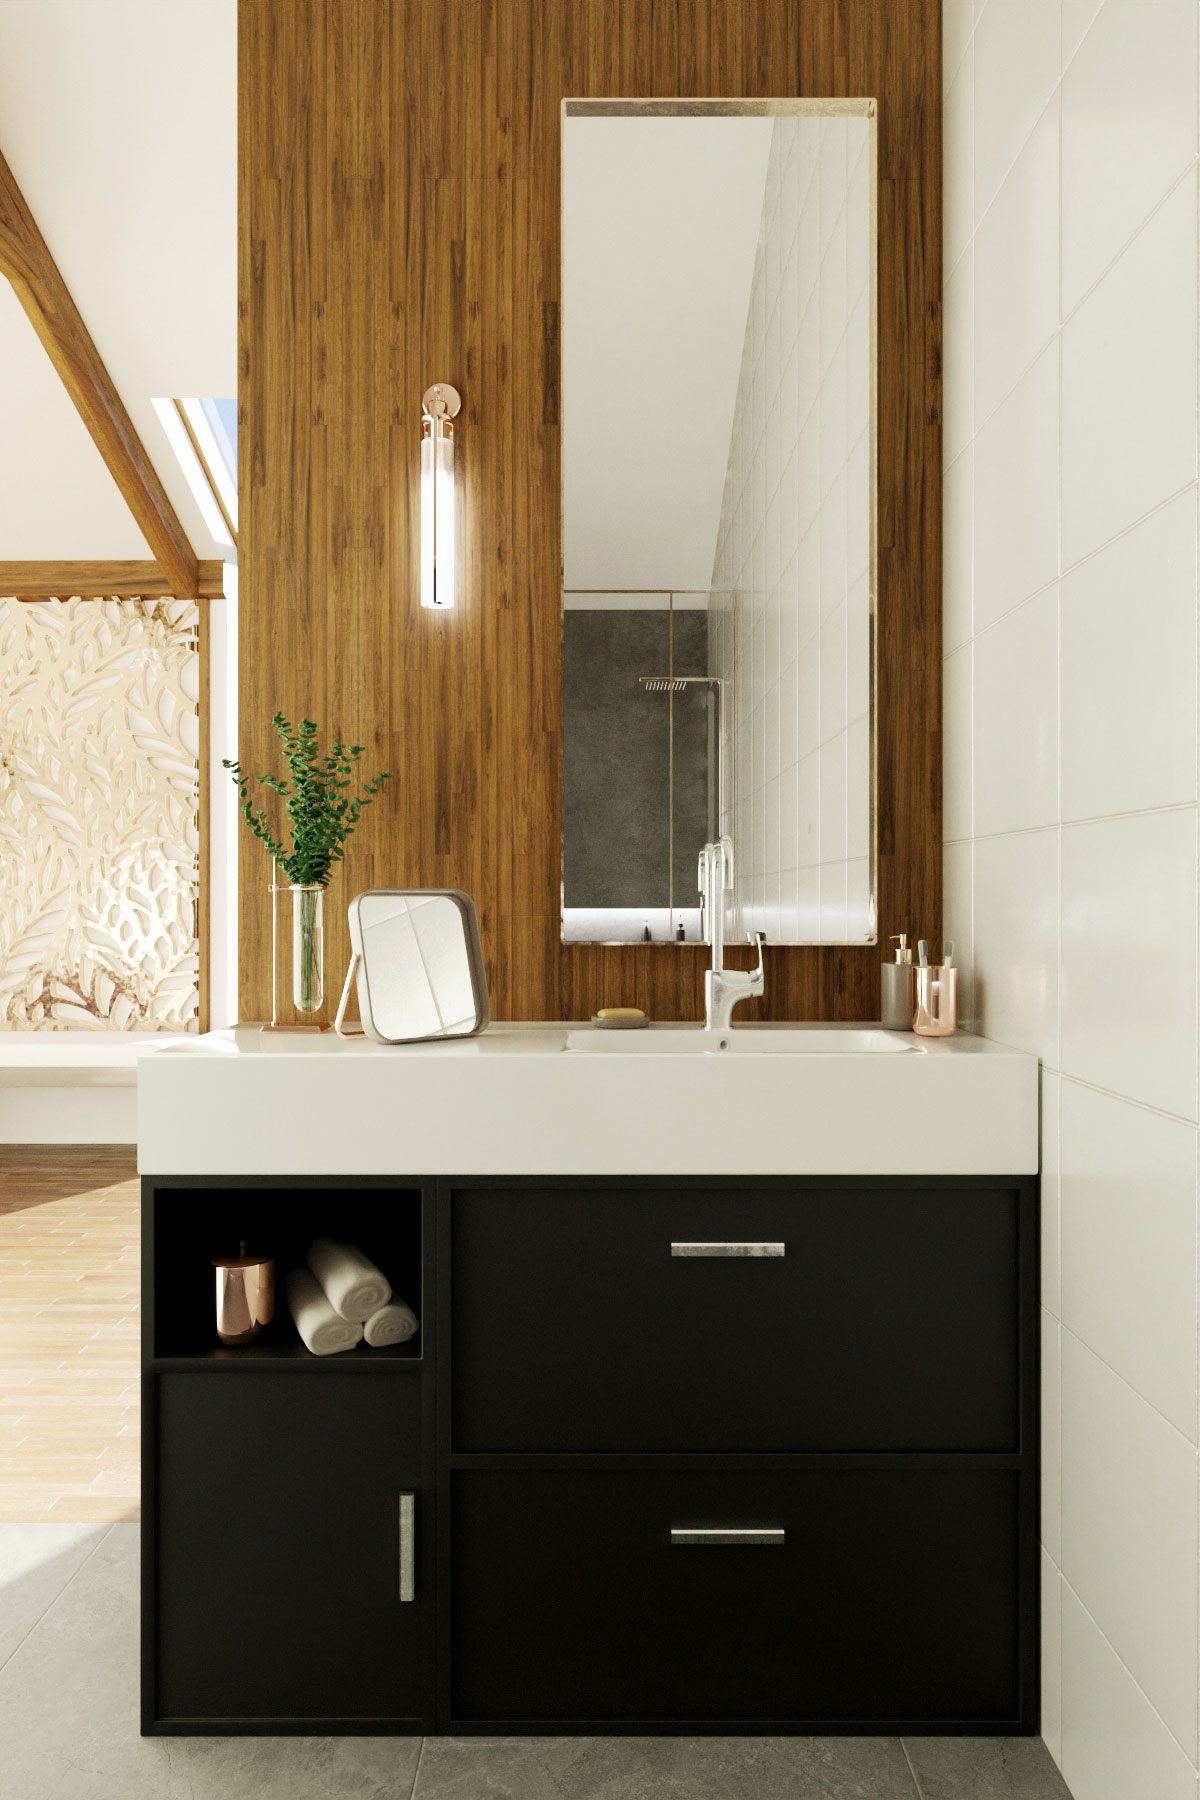 Archiviz_bathroom_01